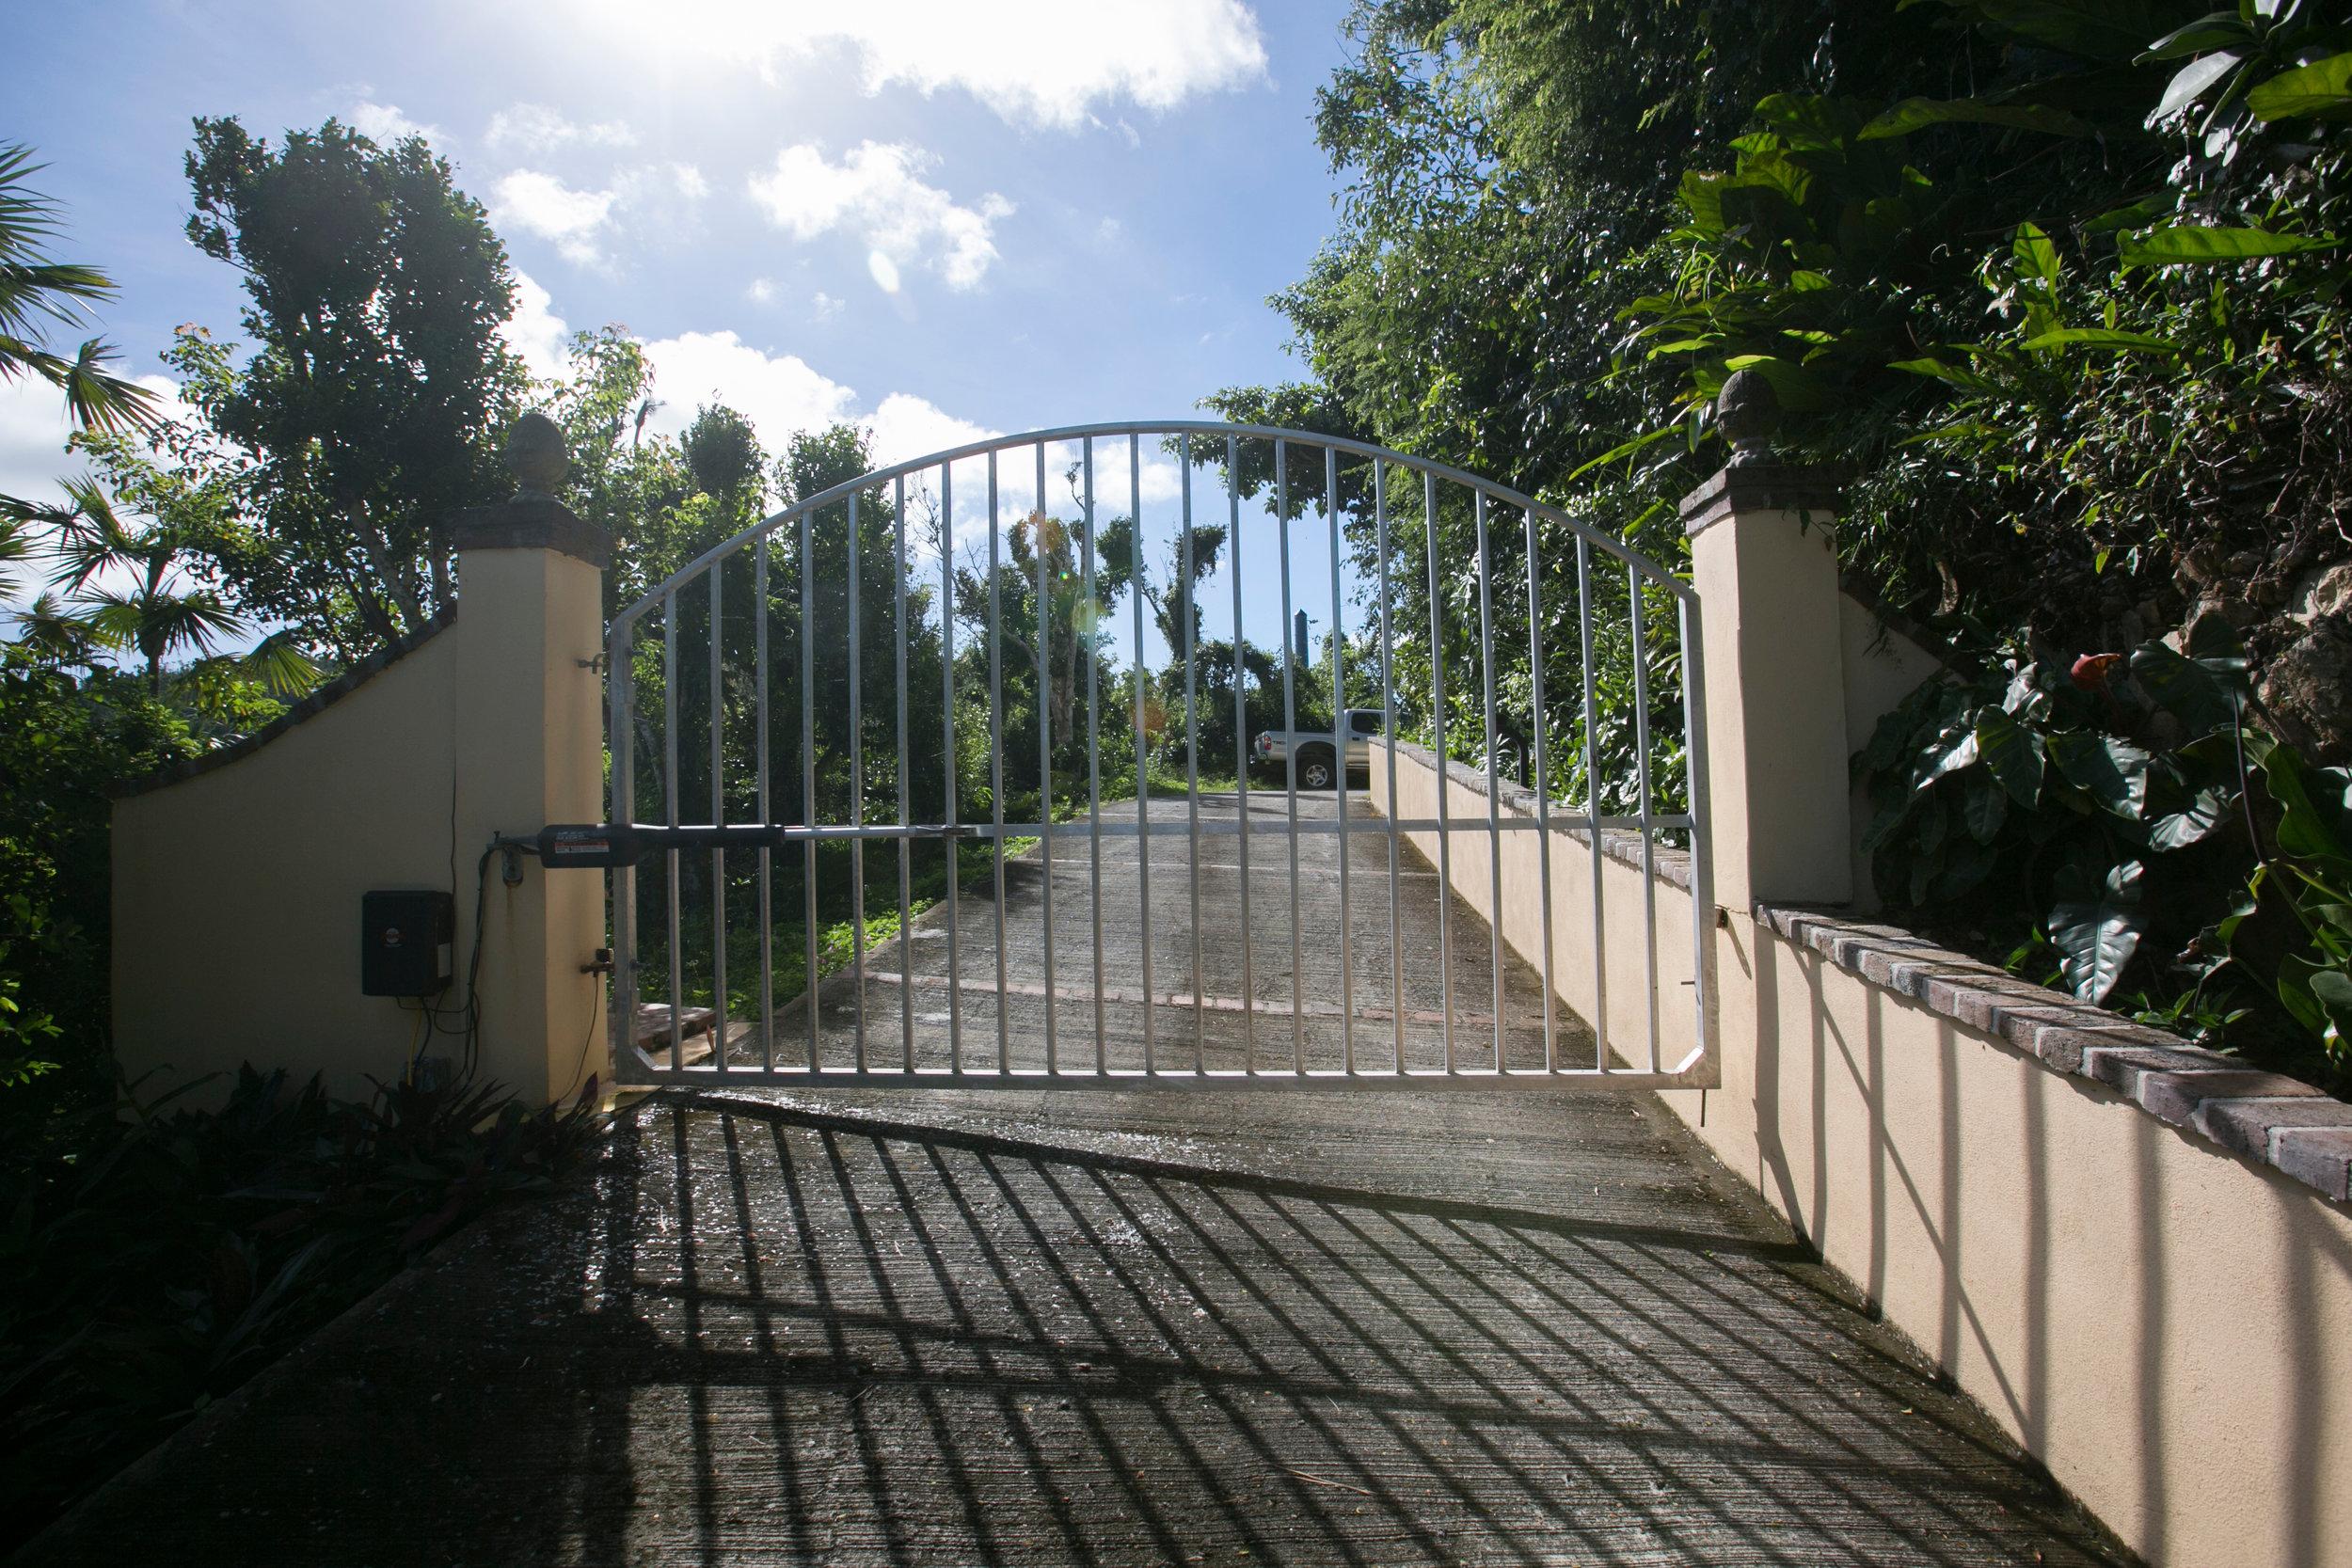 drakesview_gate-5D3B5336.jpg